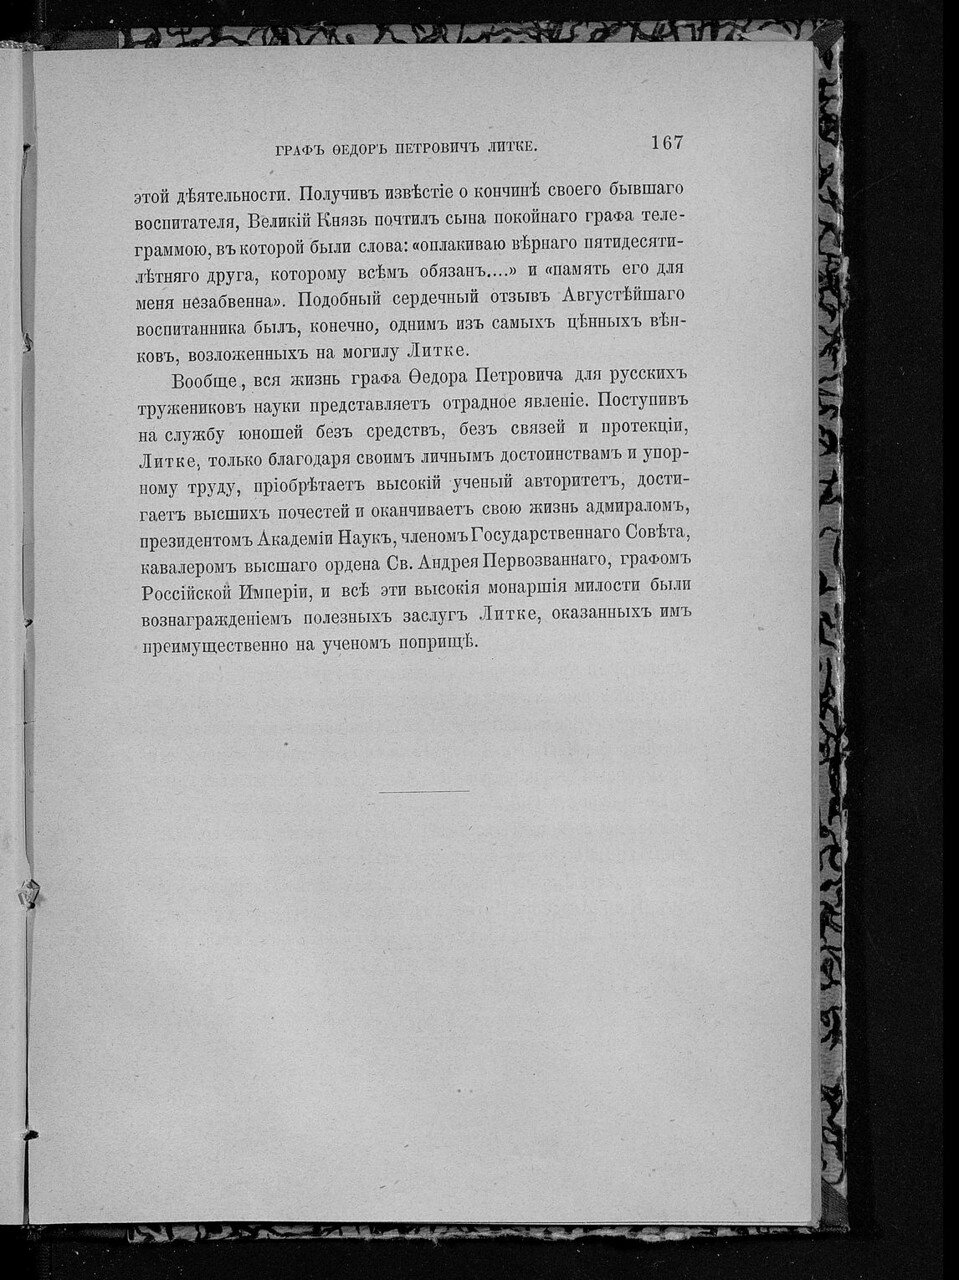 https://img-fotki.yandex.ru/get/476282/199368979.d6/0_21de45_d6c092f9_XXXL.jpg